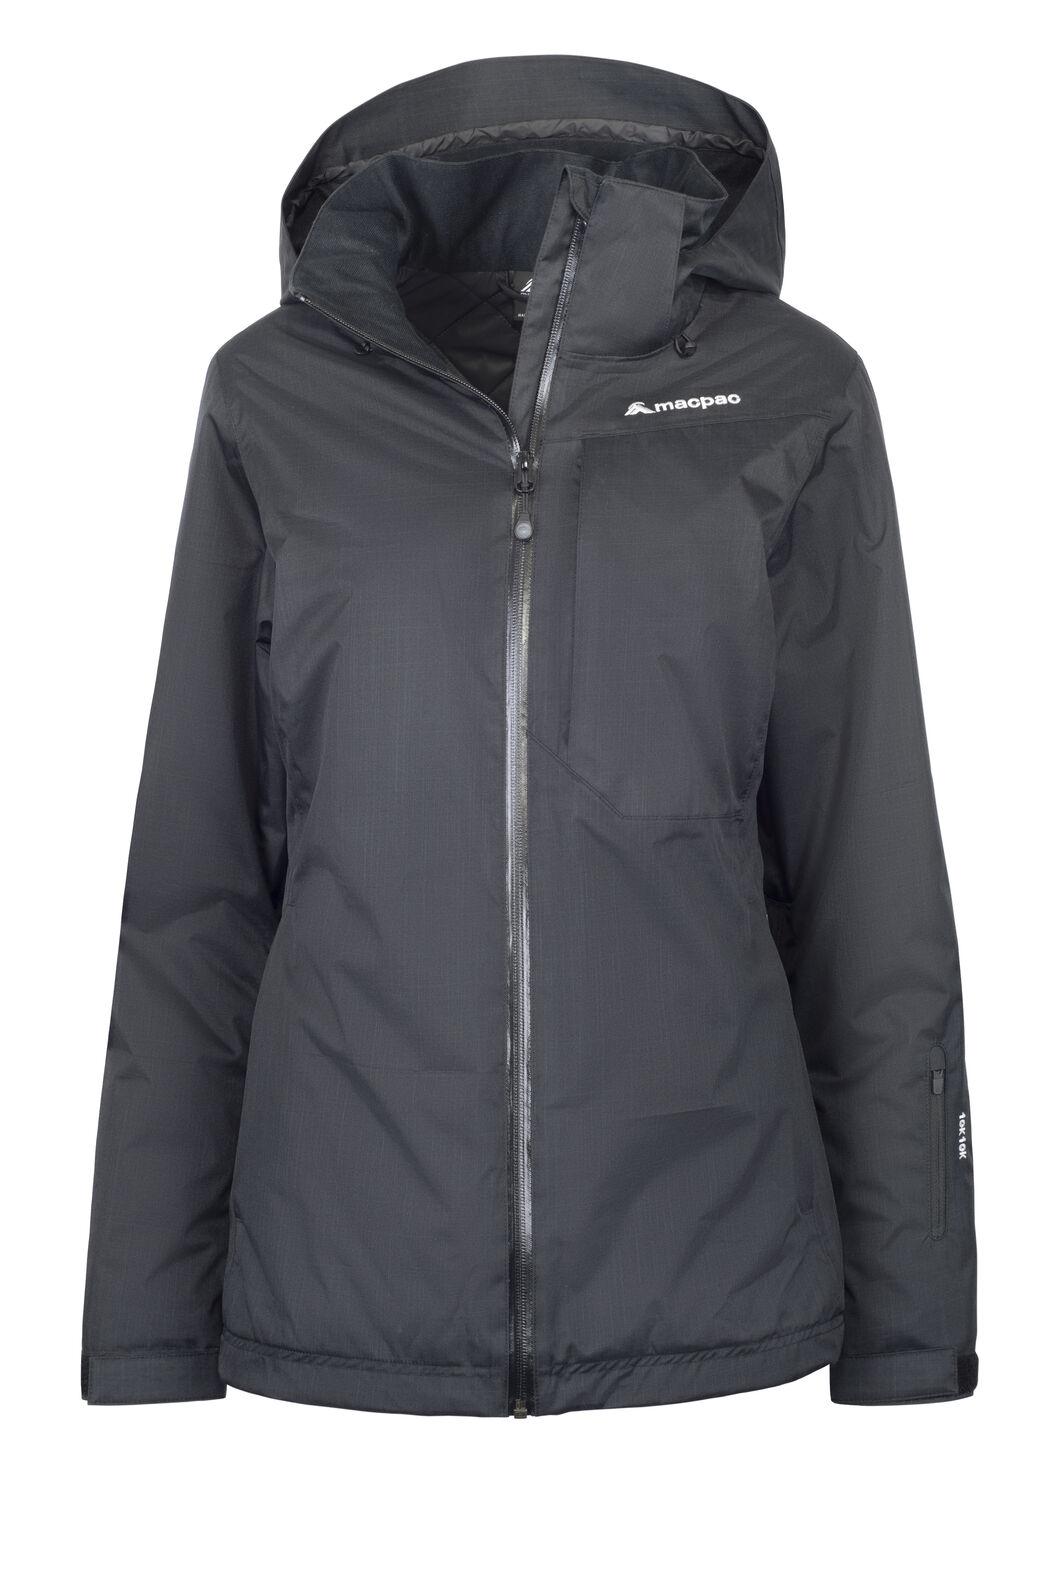 Macpac Powder Reflex™ Ski Jacket — Women's, Black, hi-res